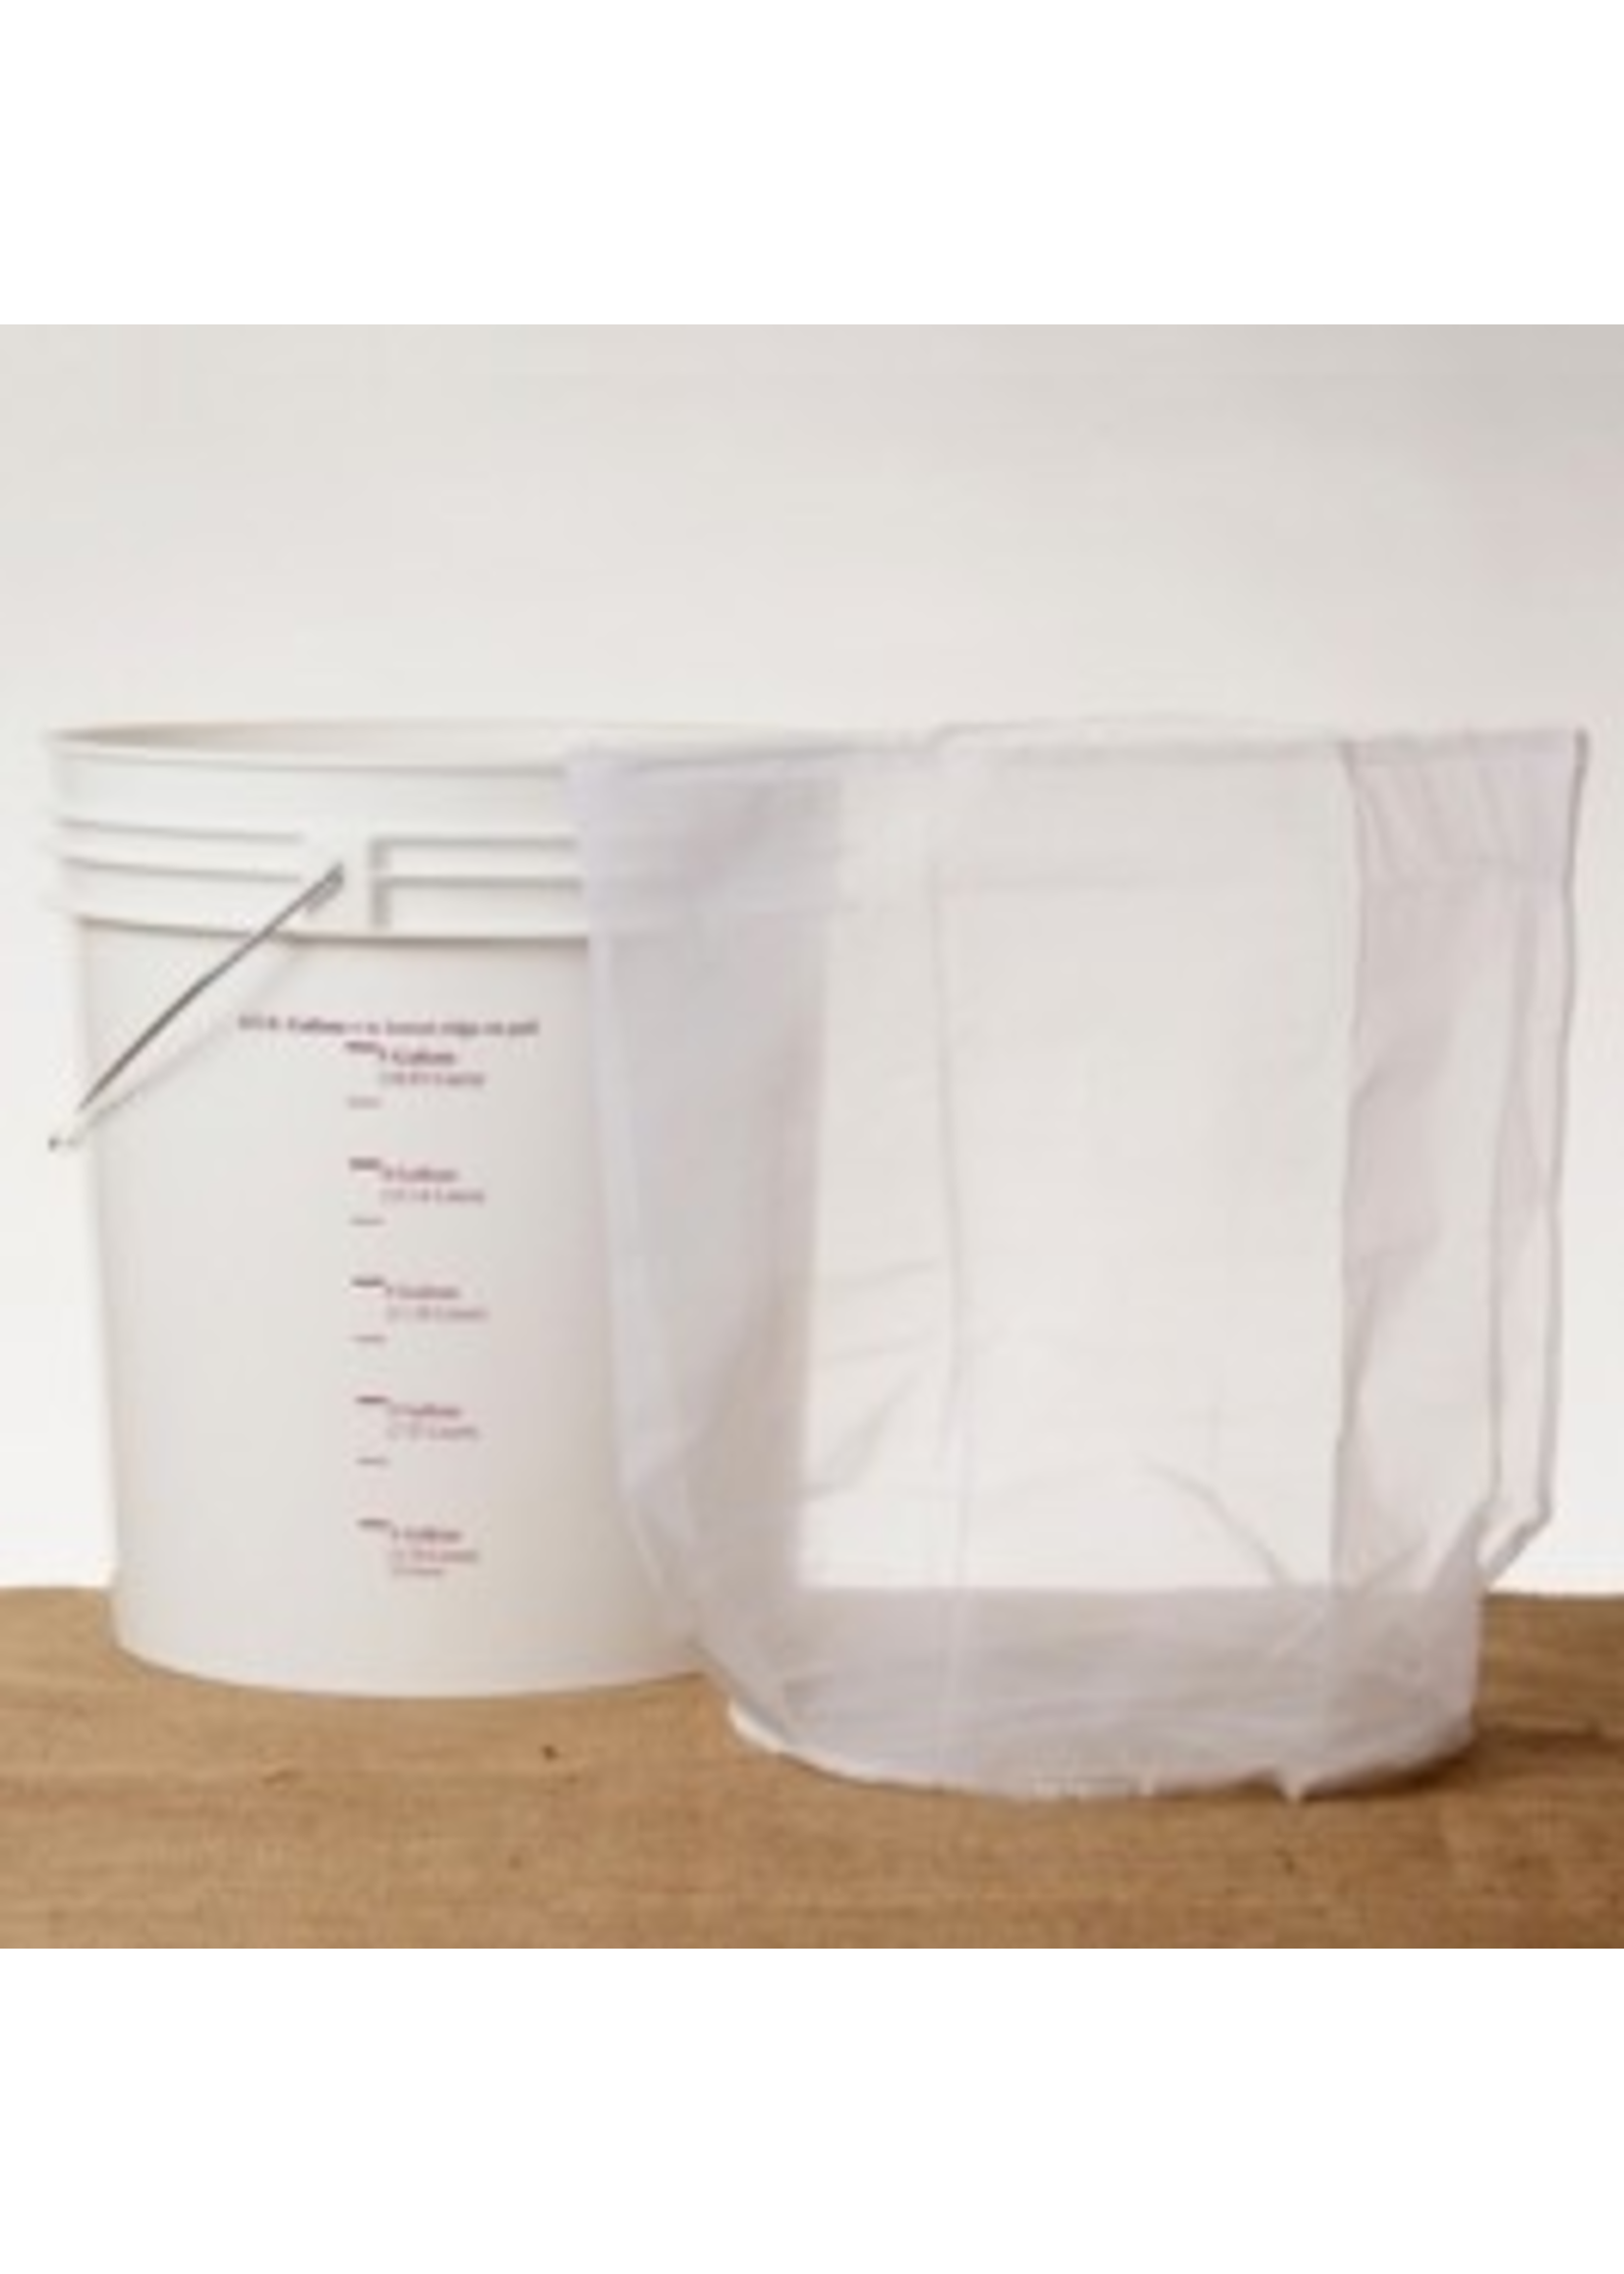 Brewing Straining Bag, Nylon - 7.8 Gallon Bucket Sparging Bag